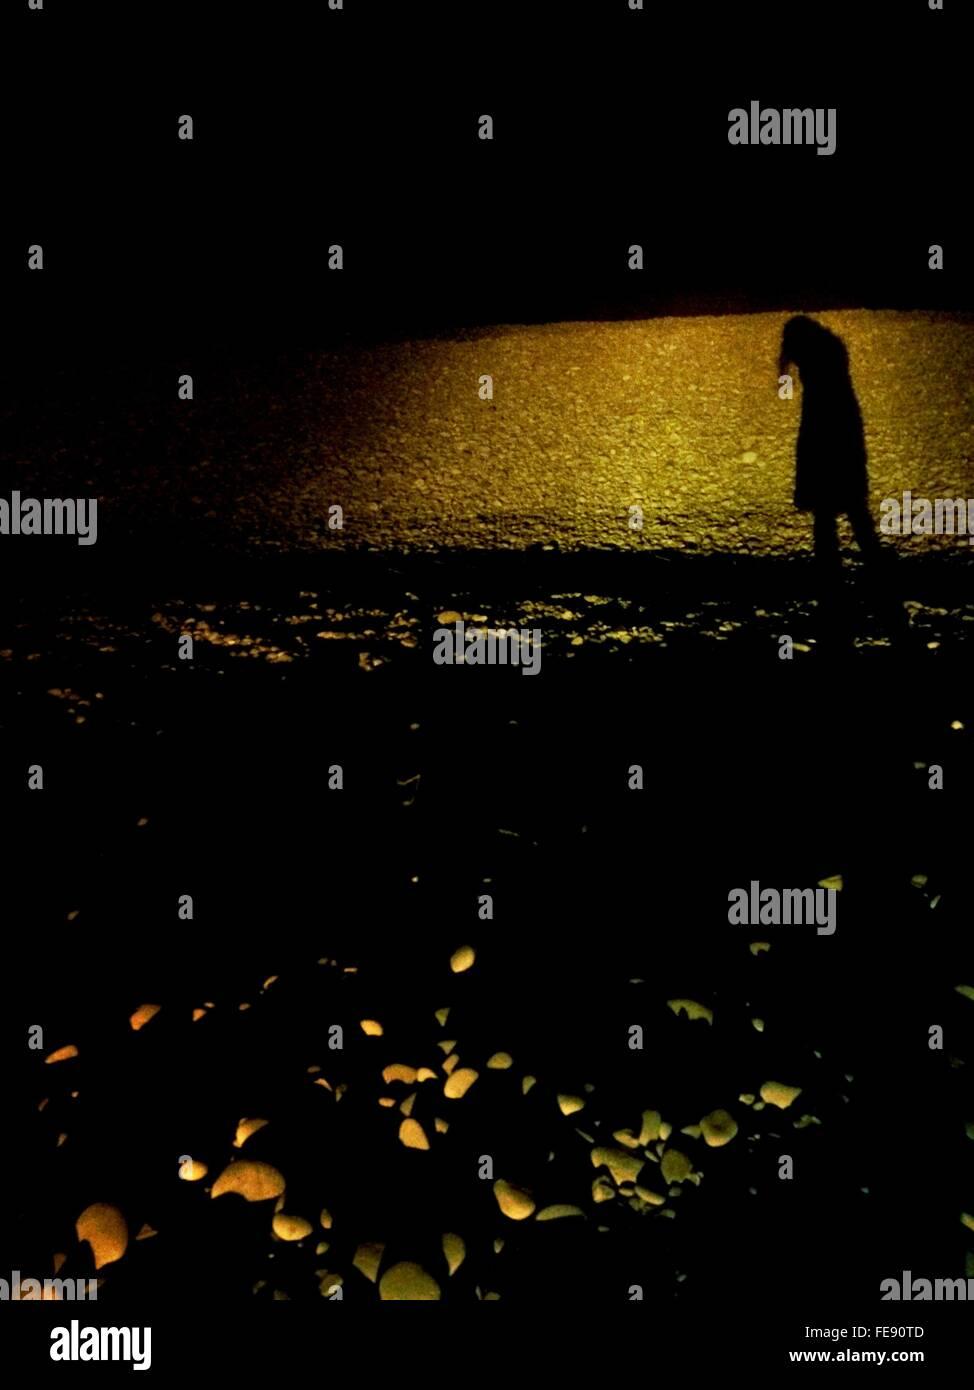 Silhouette Frau am Strand Stockbild